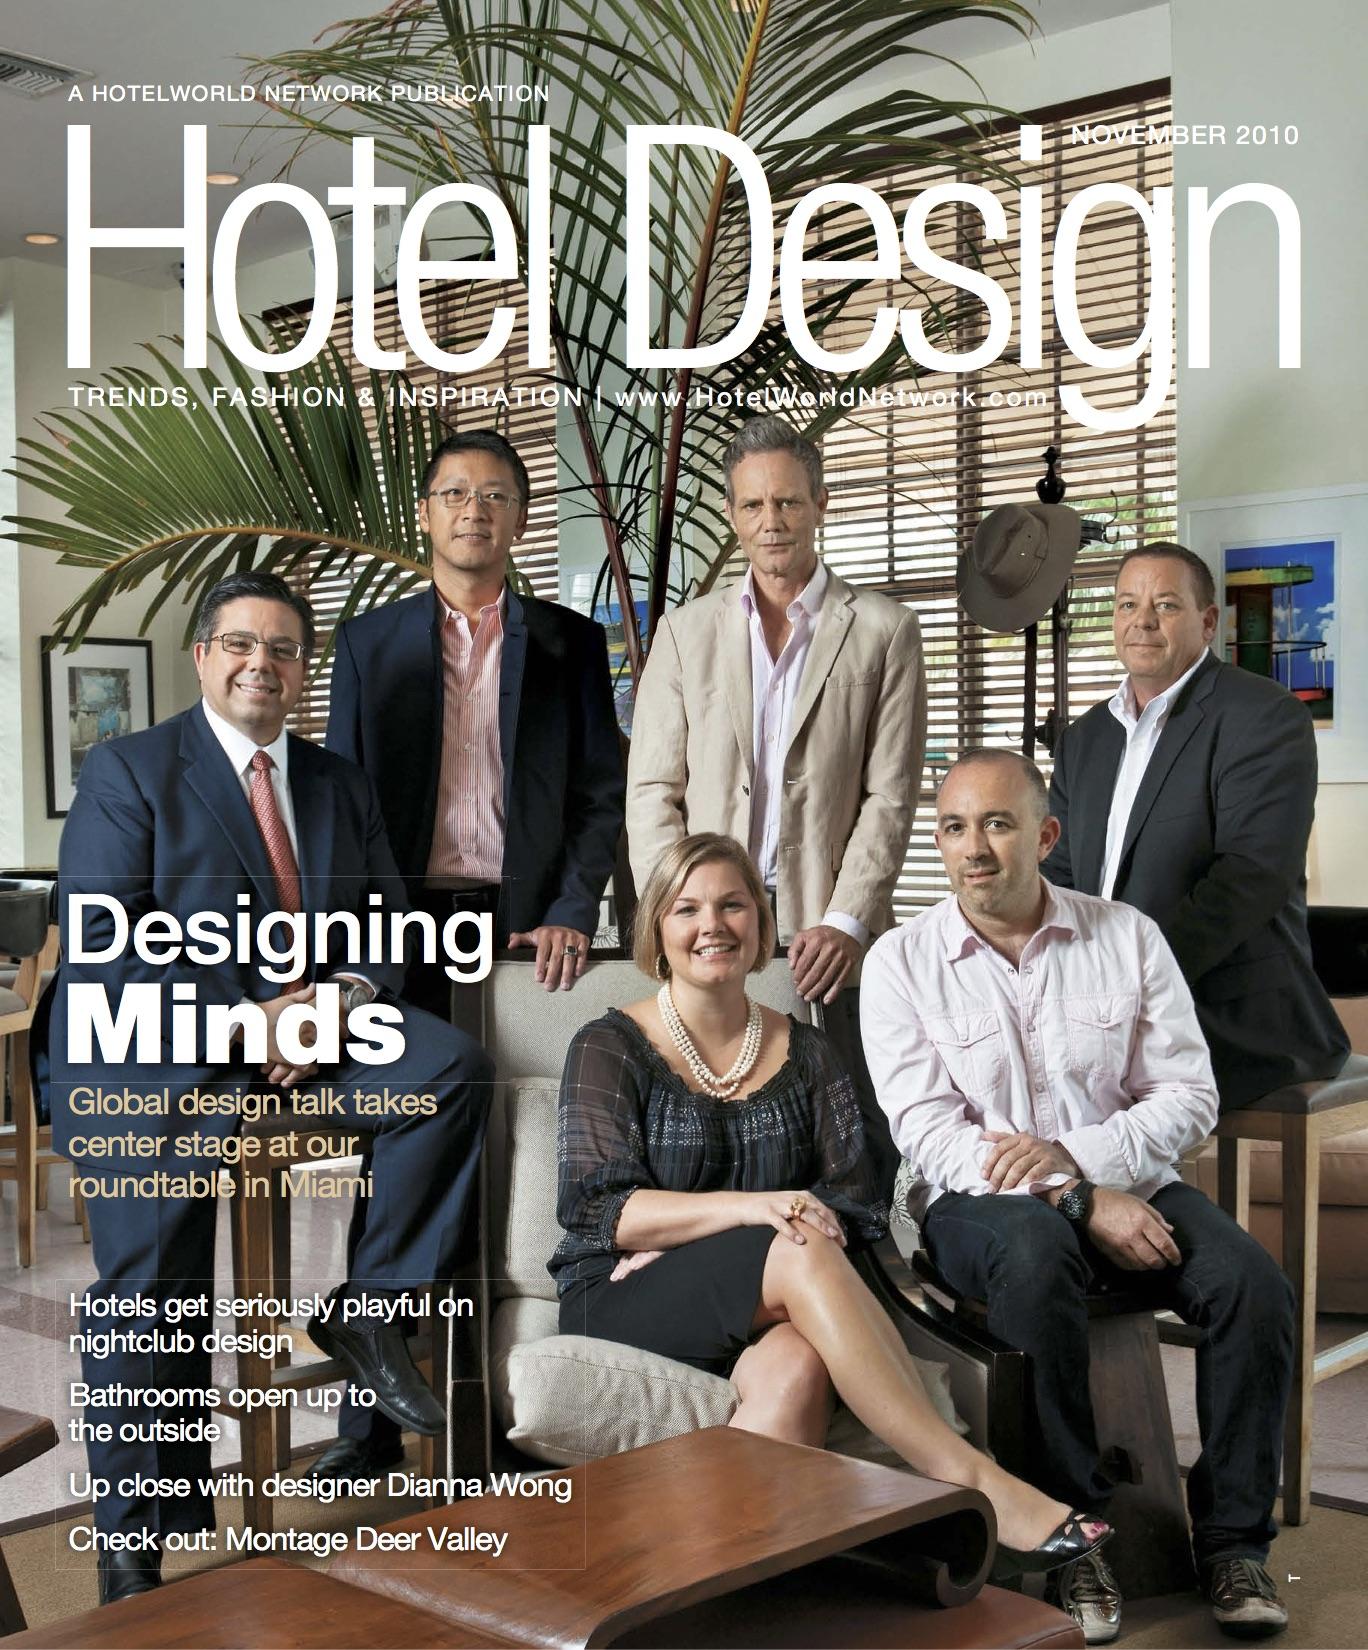 Hotel Design Nov 2010